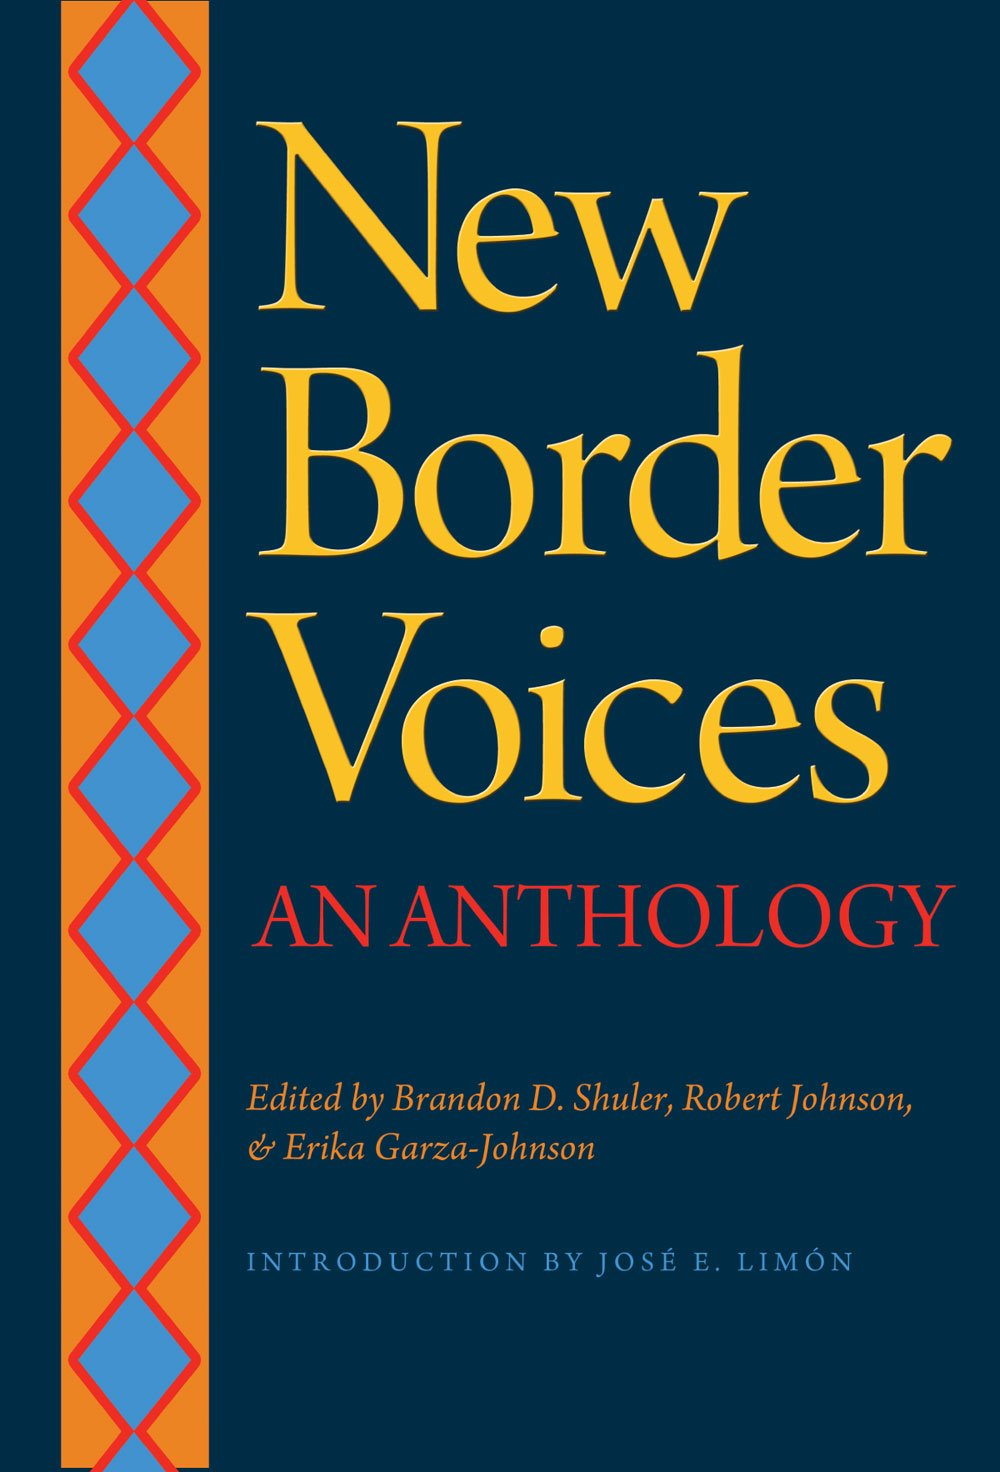 Amazon: New Border Voices: An Anthology (9781623491253): Brandon D  Shuler, Robert Johnson, Erika Garzajohnson: Books